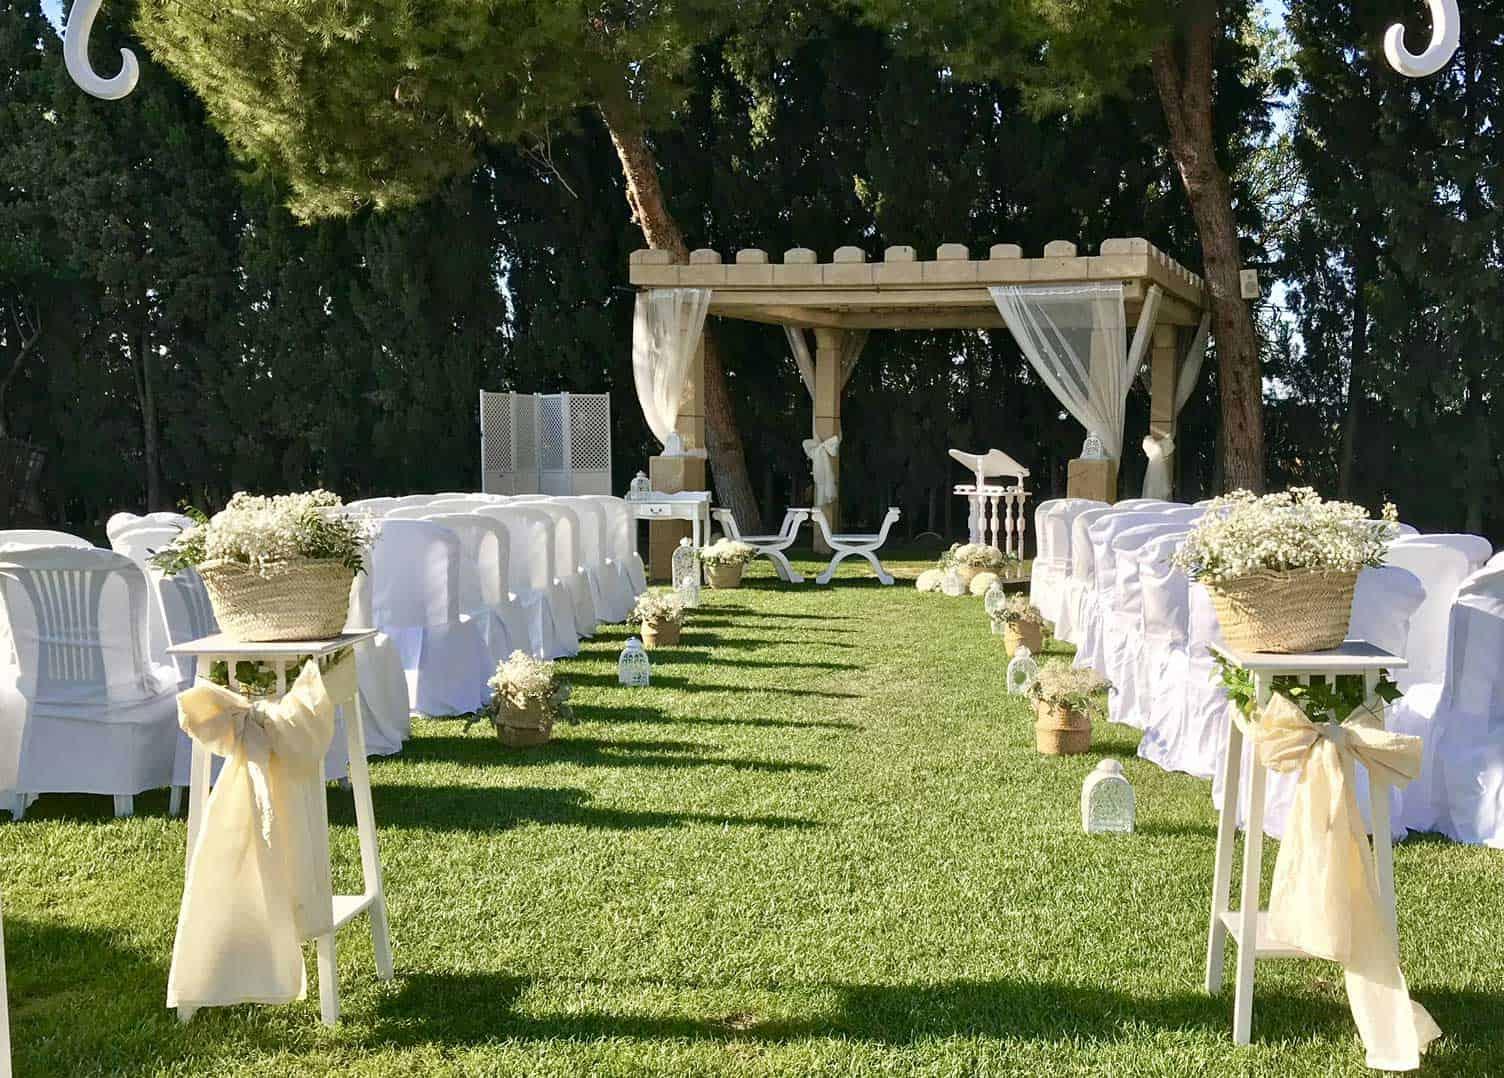 Finca-Don-Quijote-Castillo-Bonavia-bodas-civiles-aire-libre-B